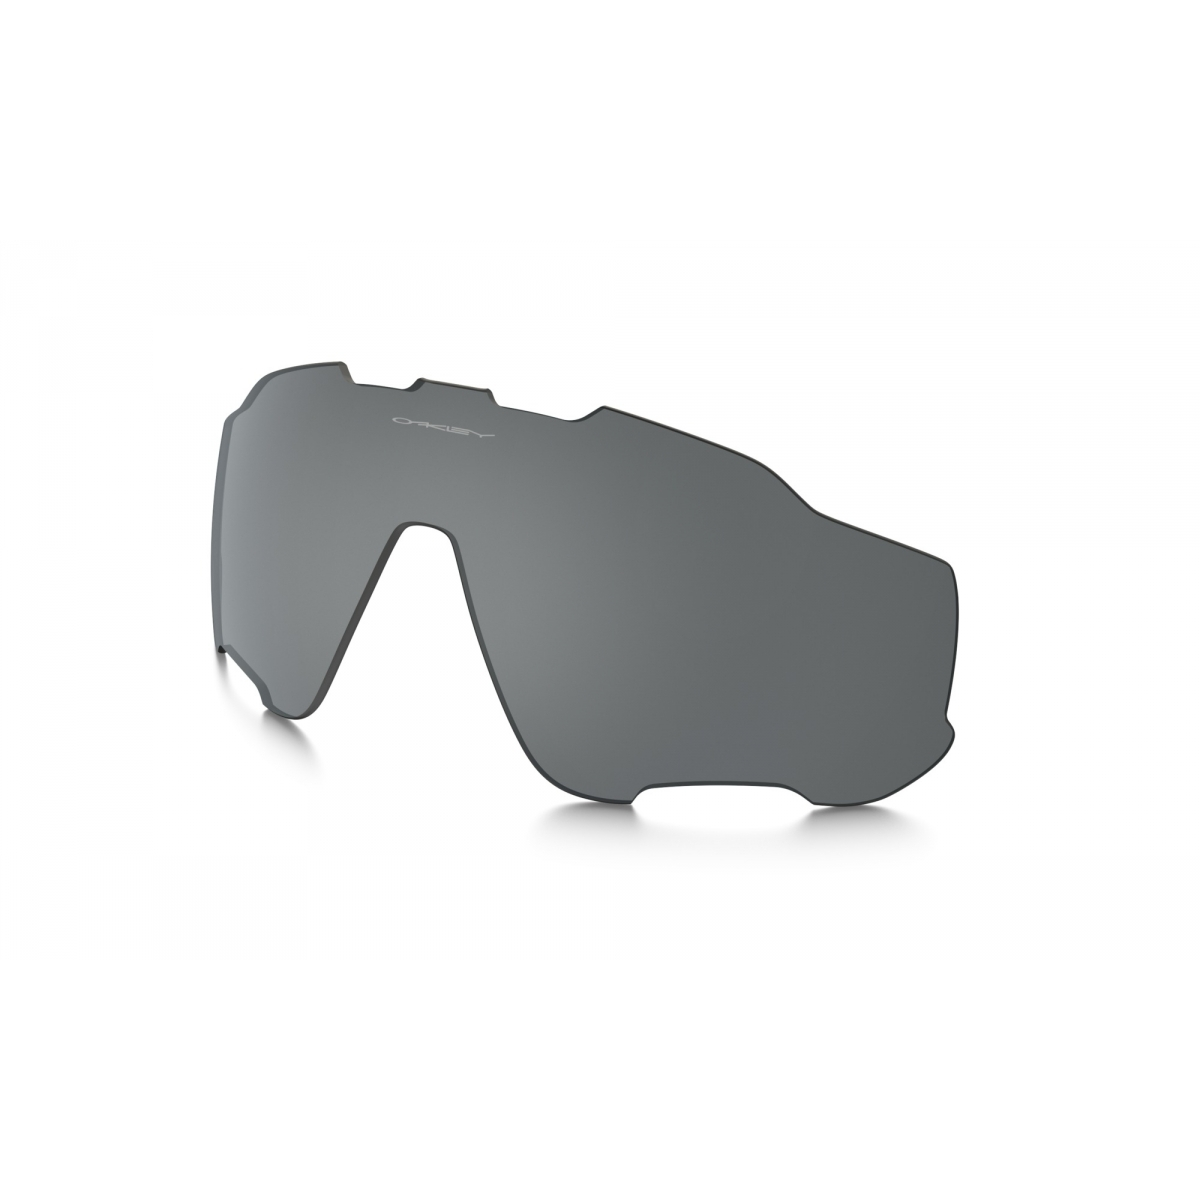 34735a74ed170 Kit De Verres Oakley Lens Jawbreaker Black Iridium